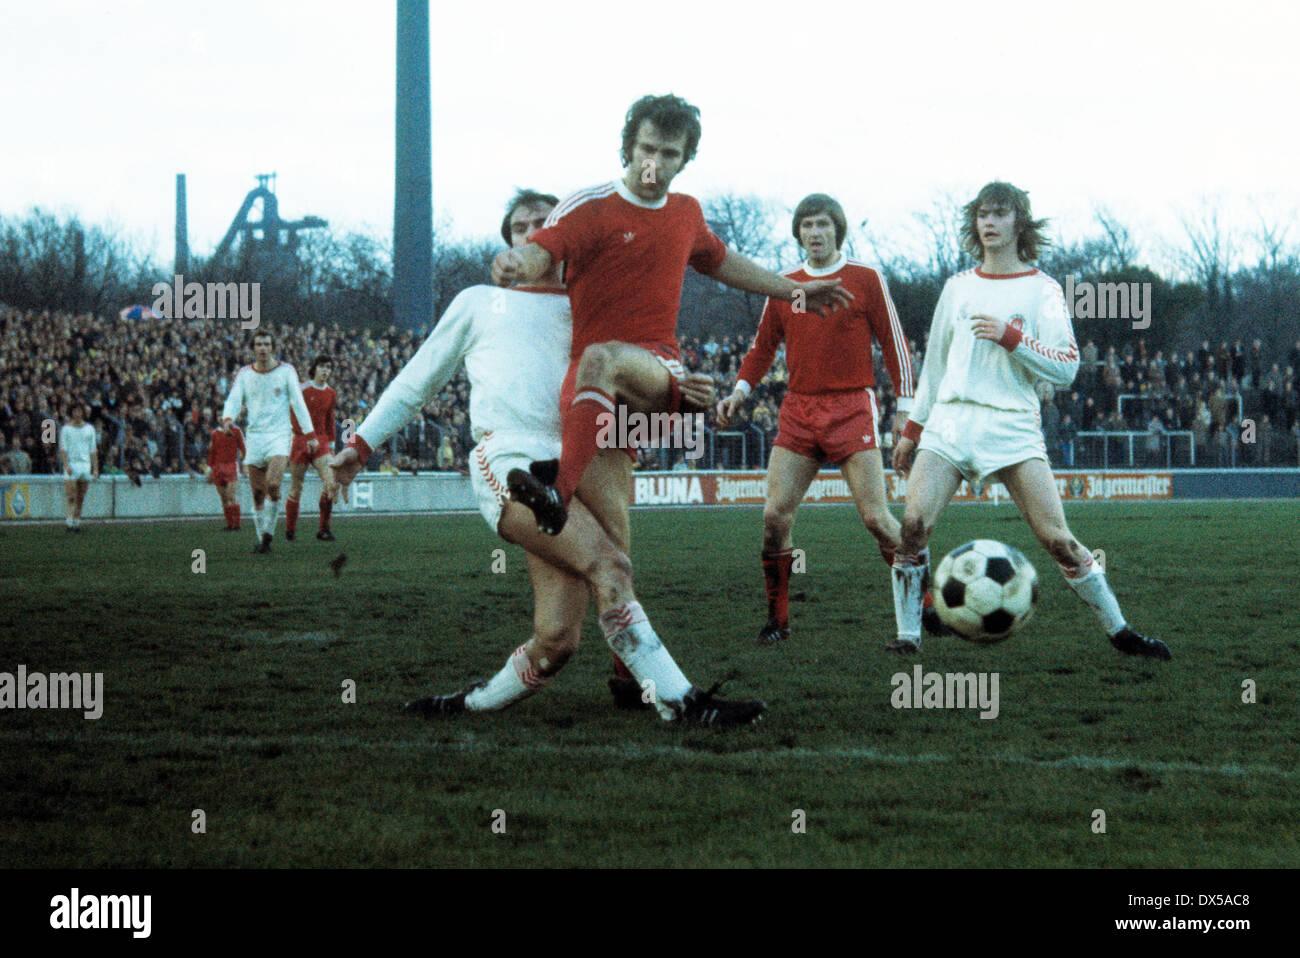 football, 2. Bundesliga Nord, 1974/1975, Niederrheinstadion, Rot Weiss Oberhausen versus FC St. Pauli Hamburg 0:0, scene of the match, Walter Krause (RWO) 2.f.l. fighting for the ball, behind Juergen Jaeger (RWO) 3.f.l. - Stock Image